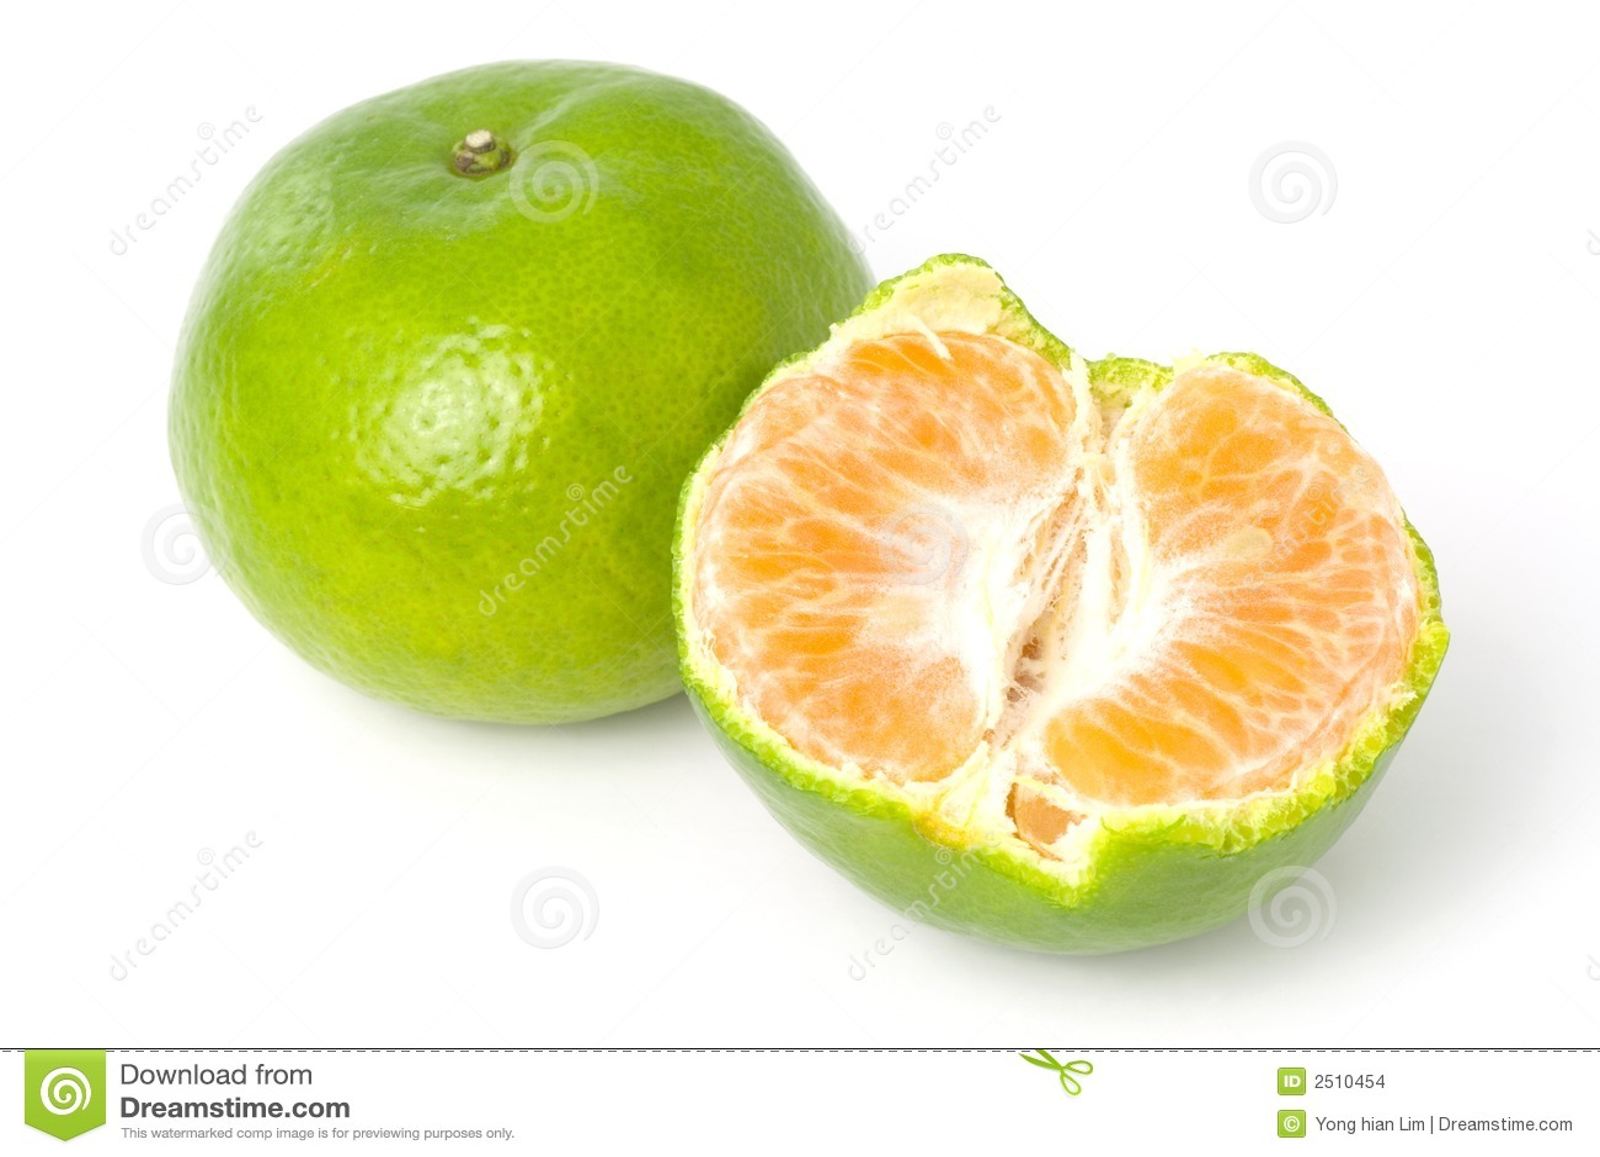 Terrine en gele de mandarine la menthe - Cuisine